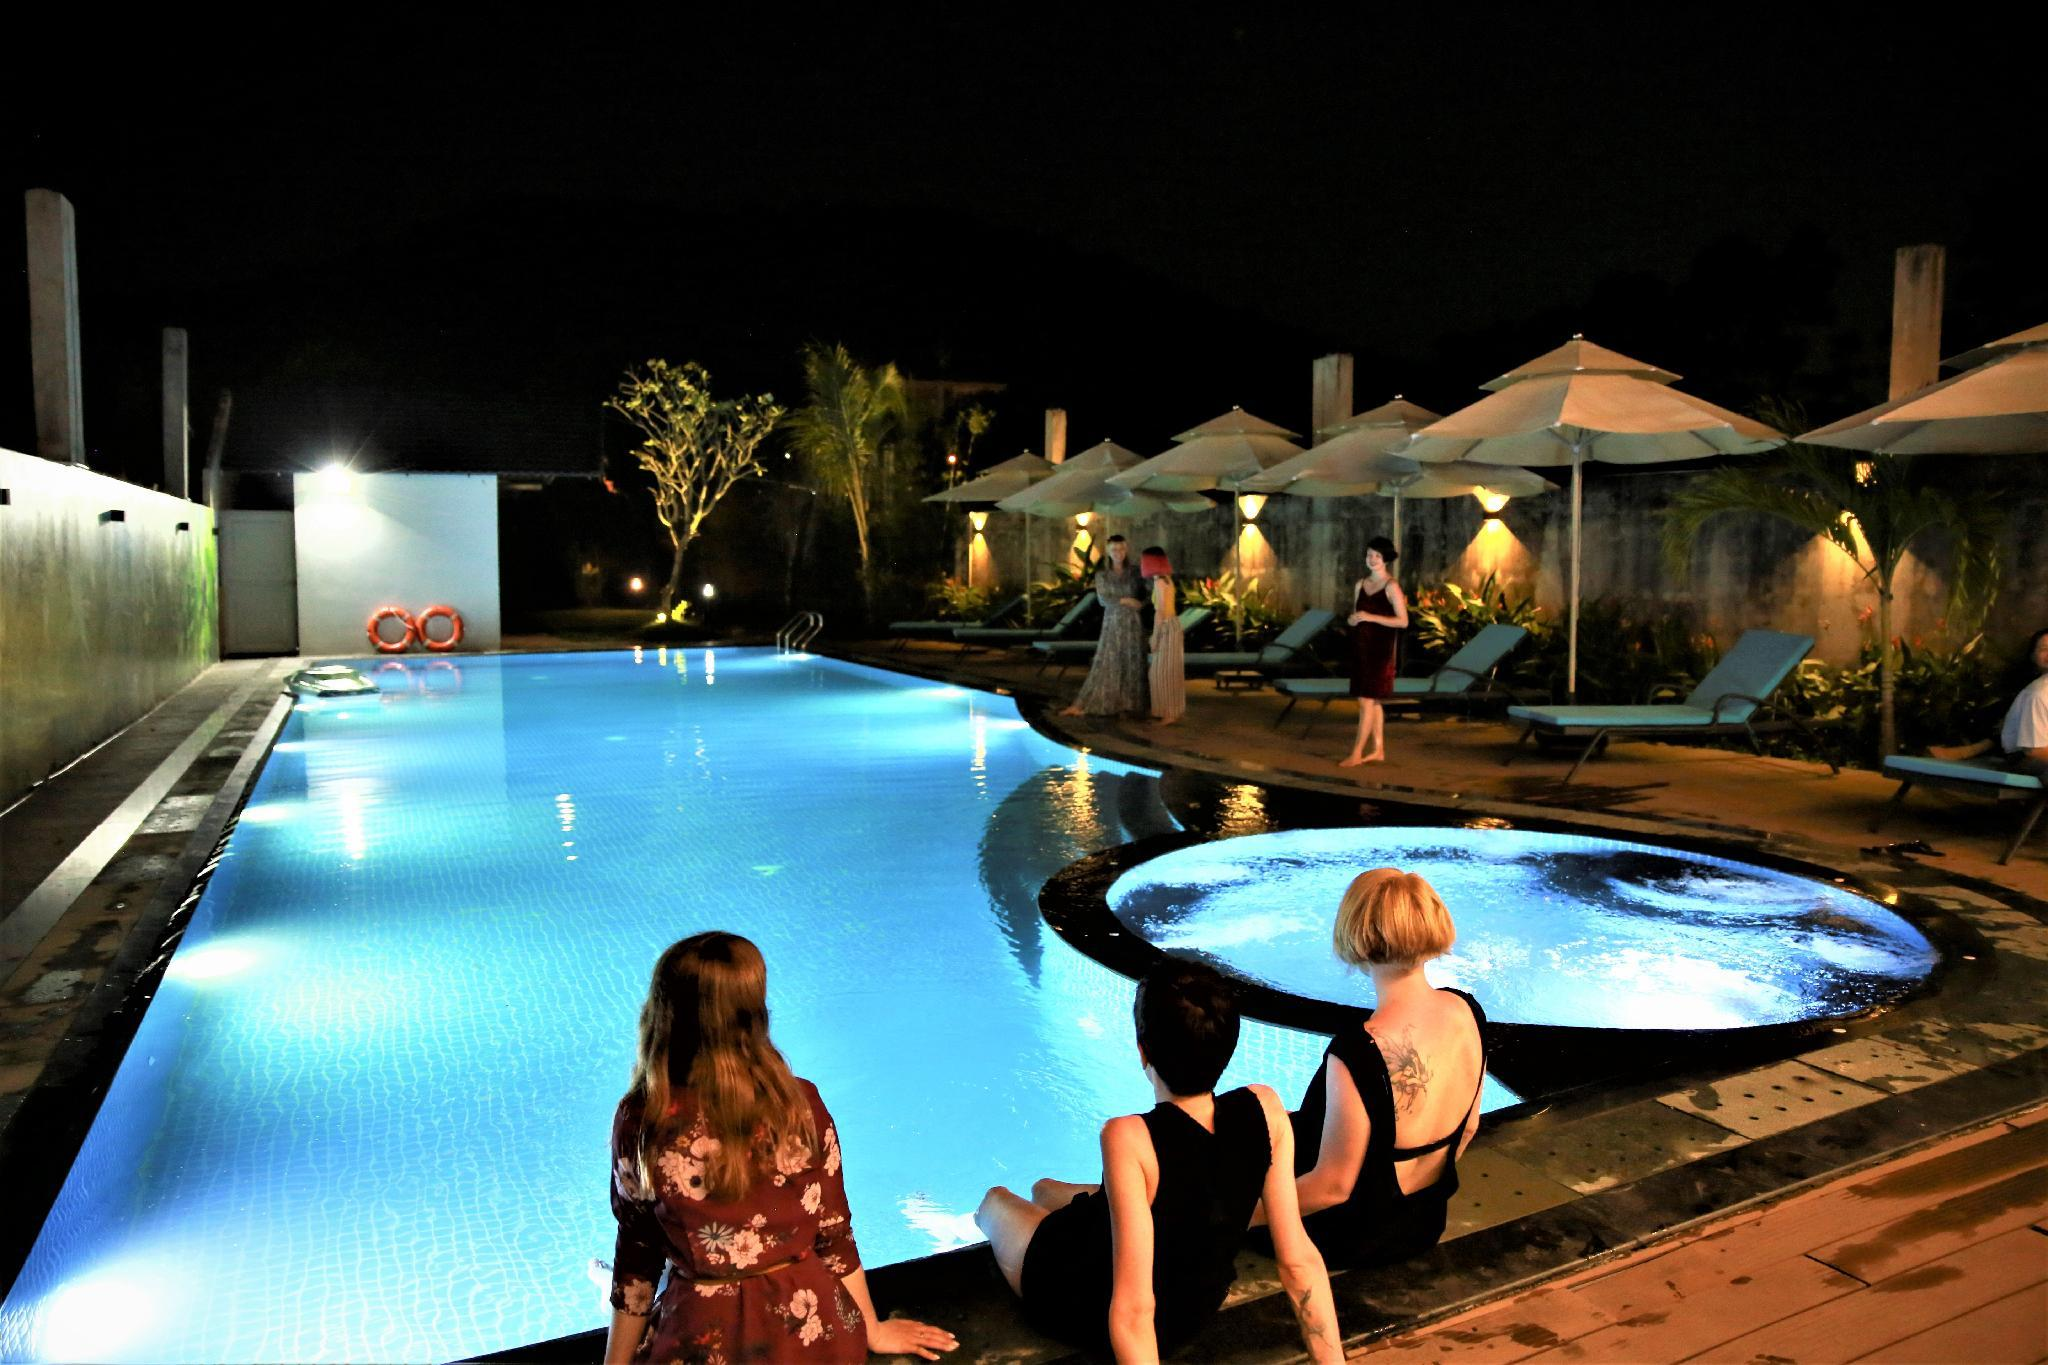 THELAM Resort